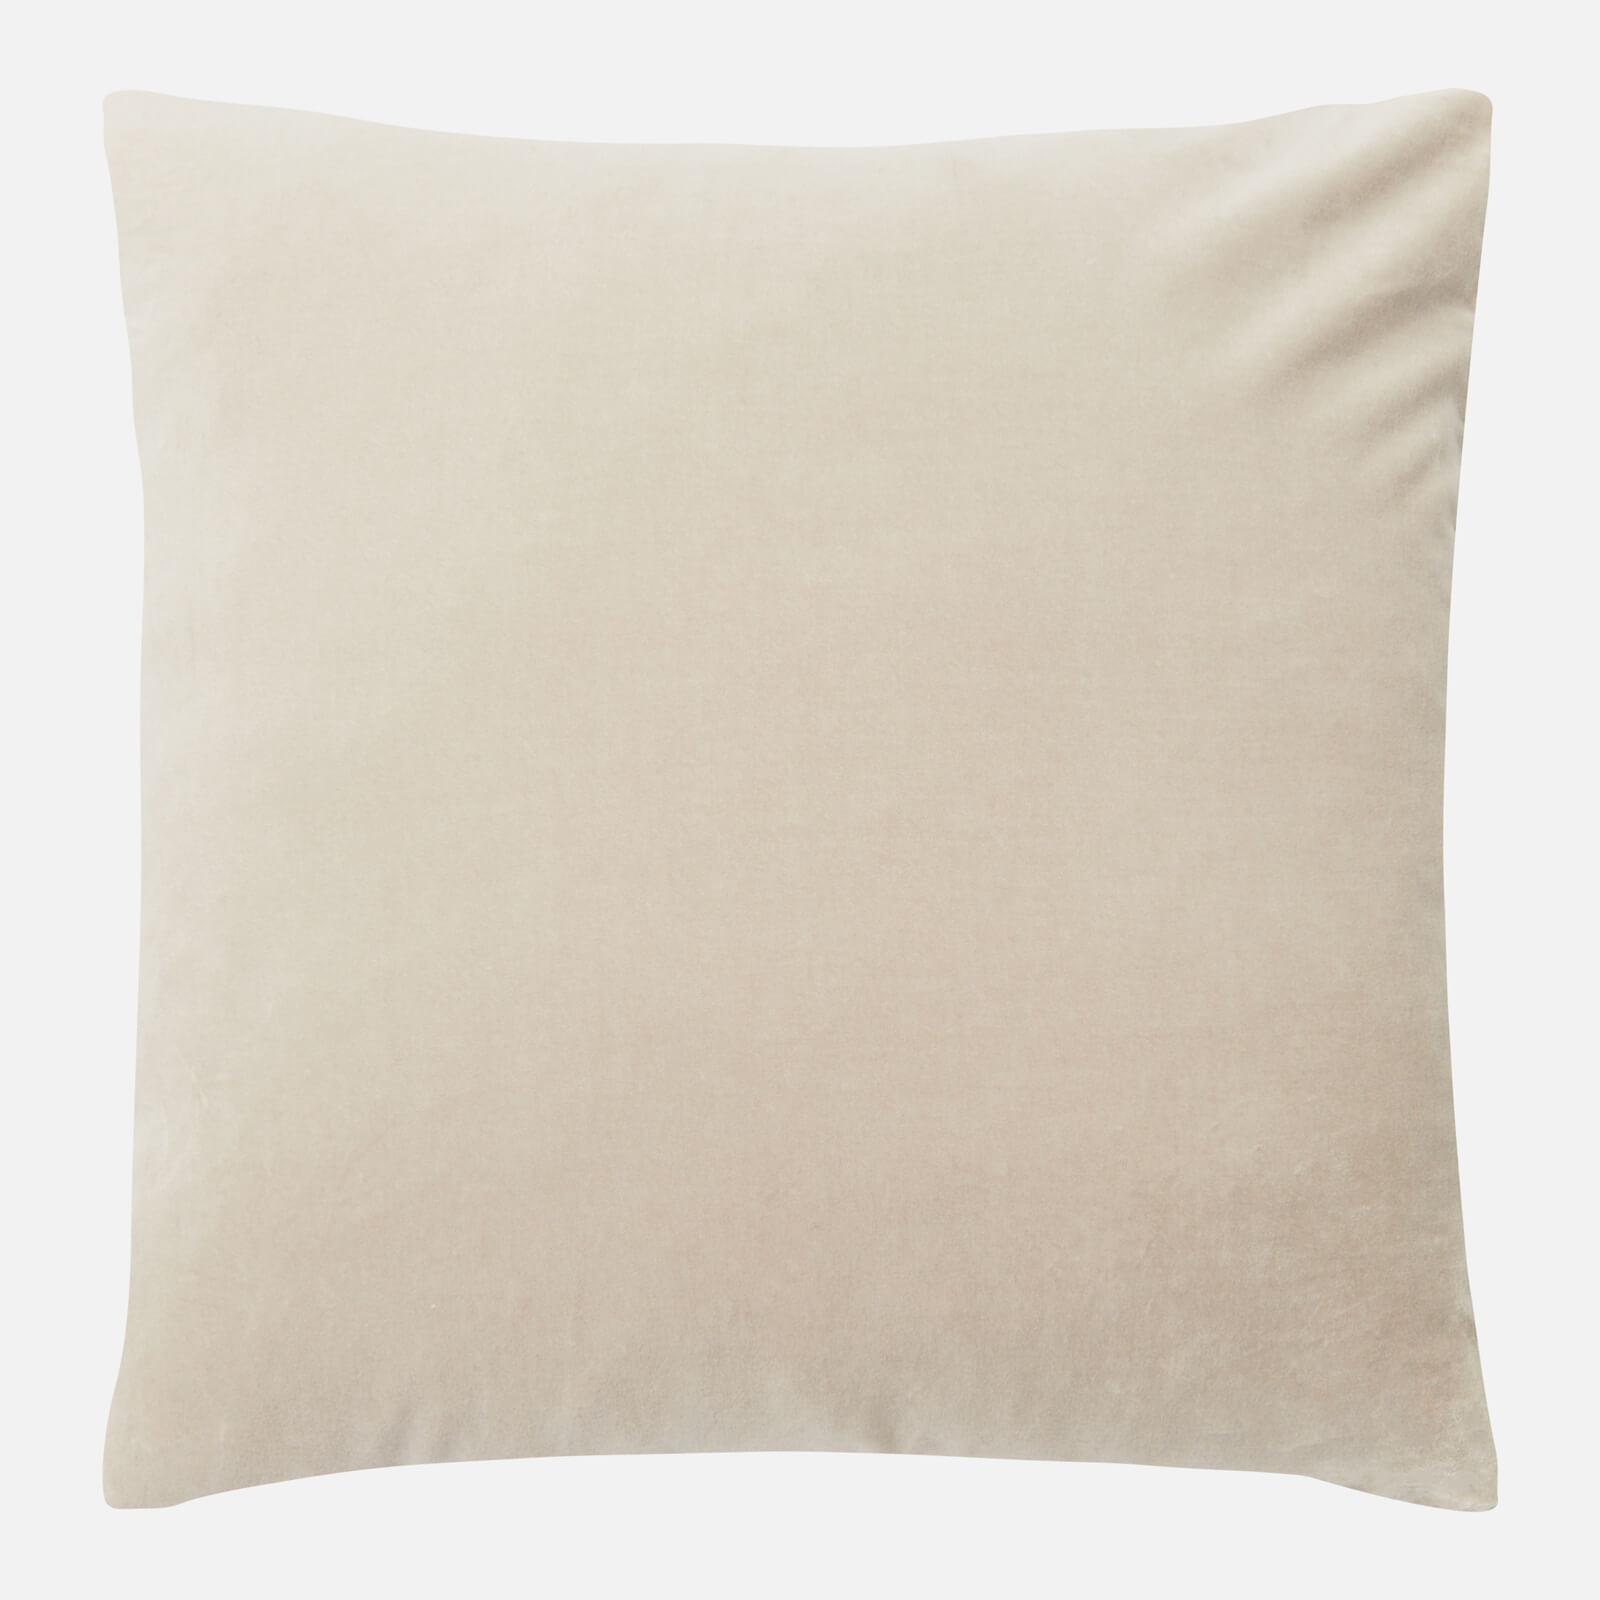 in homeware Cotton Velvet Cushion - Natural